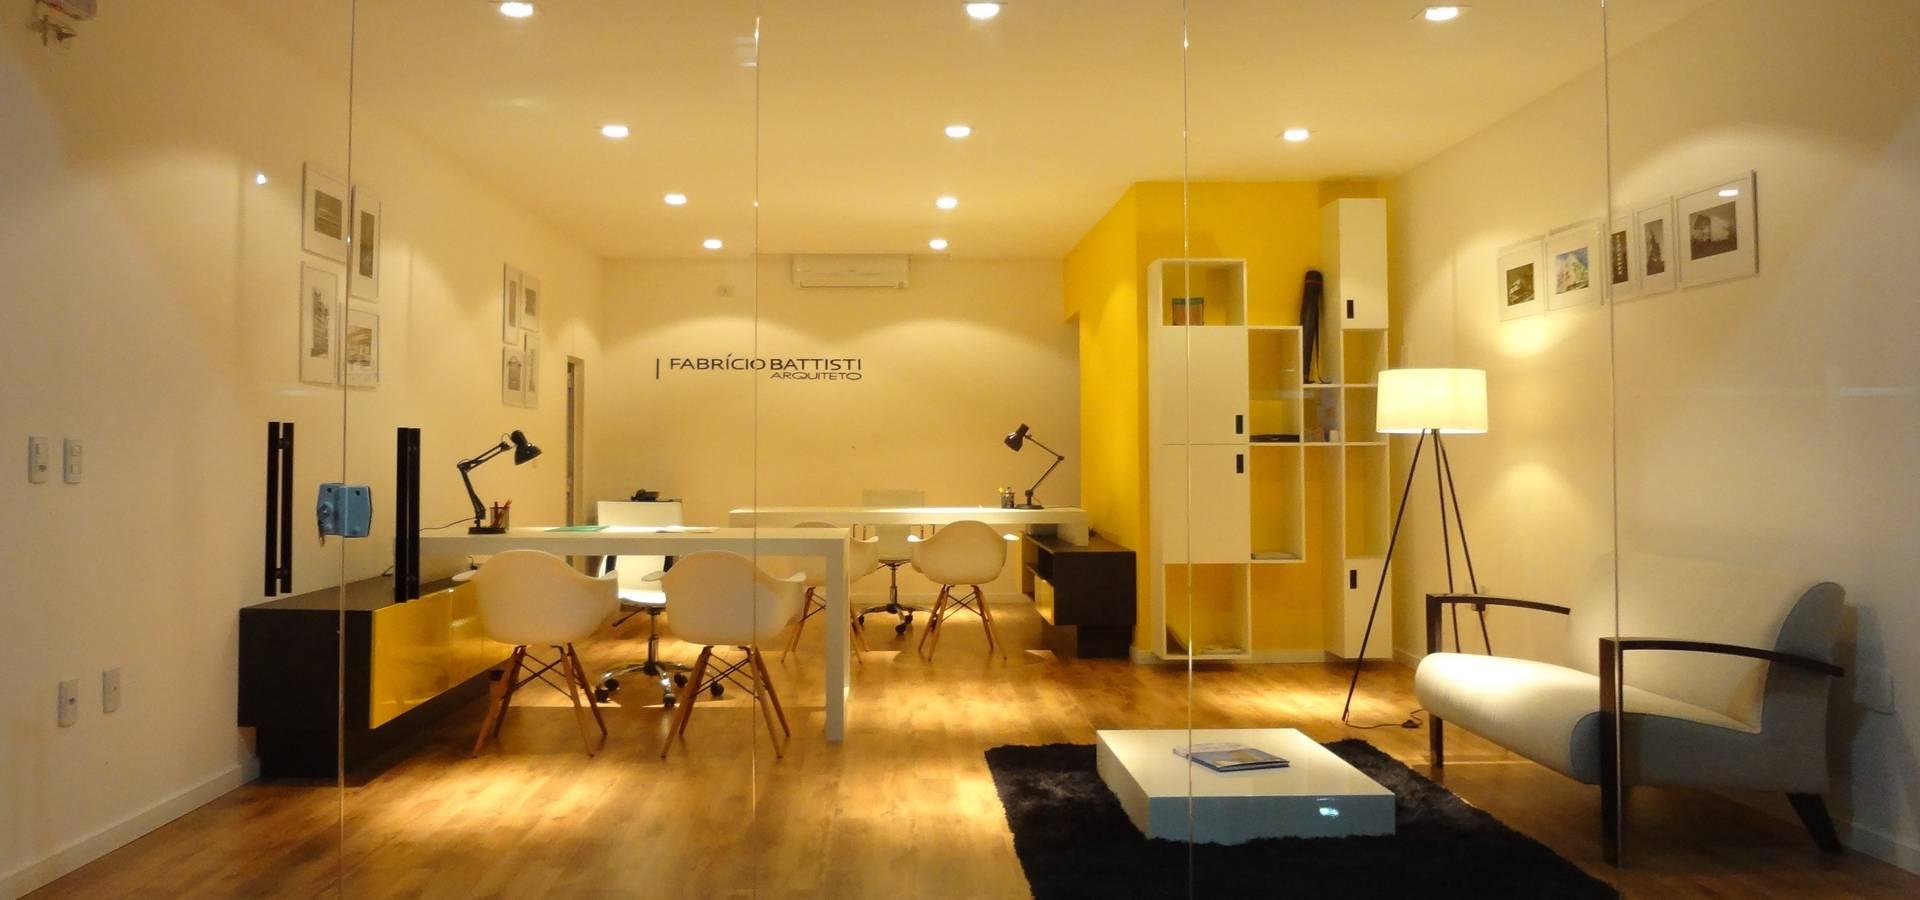 Studio Fabricio Battisti